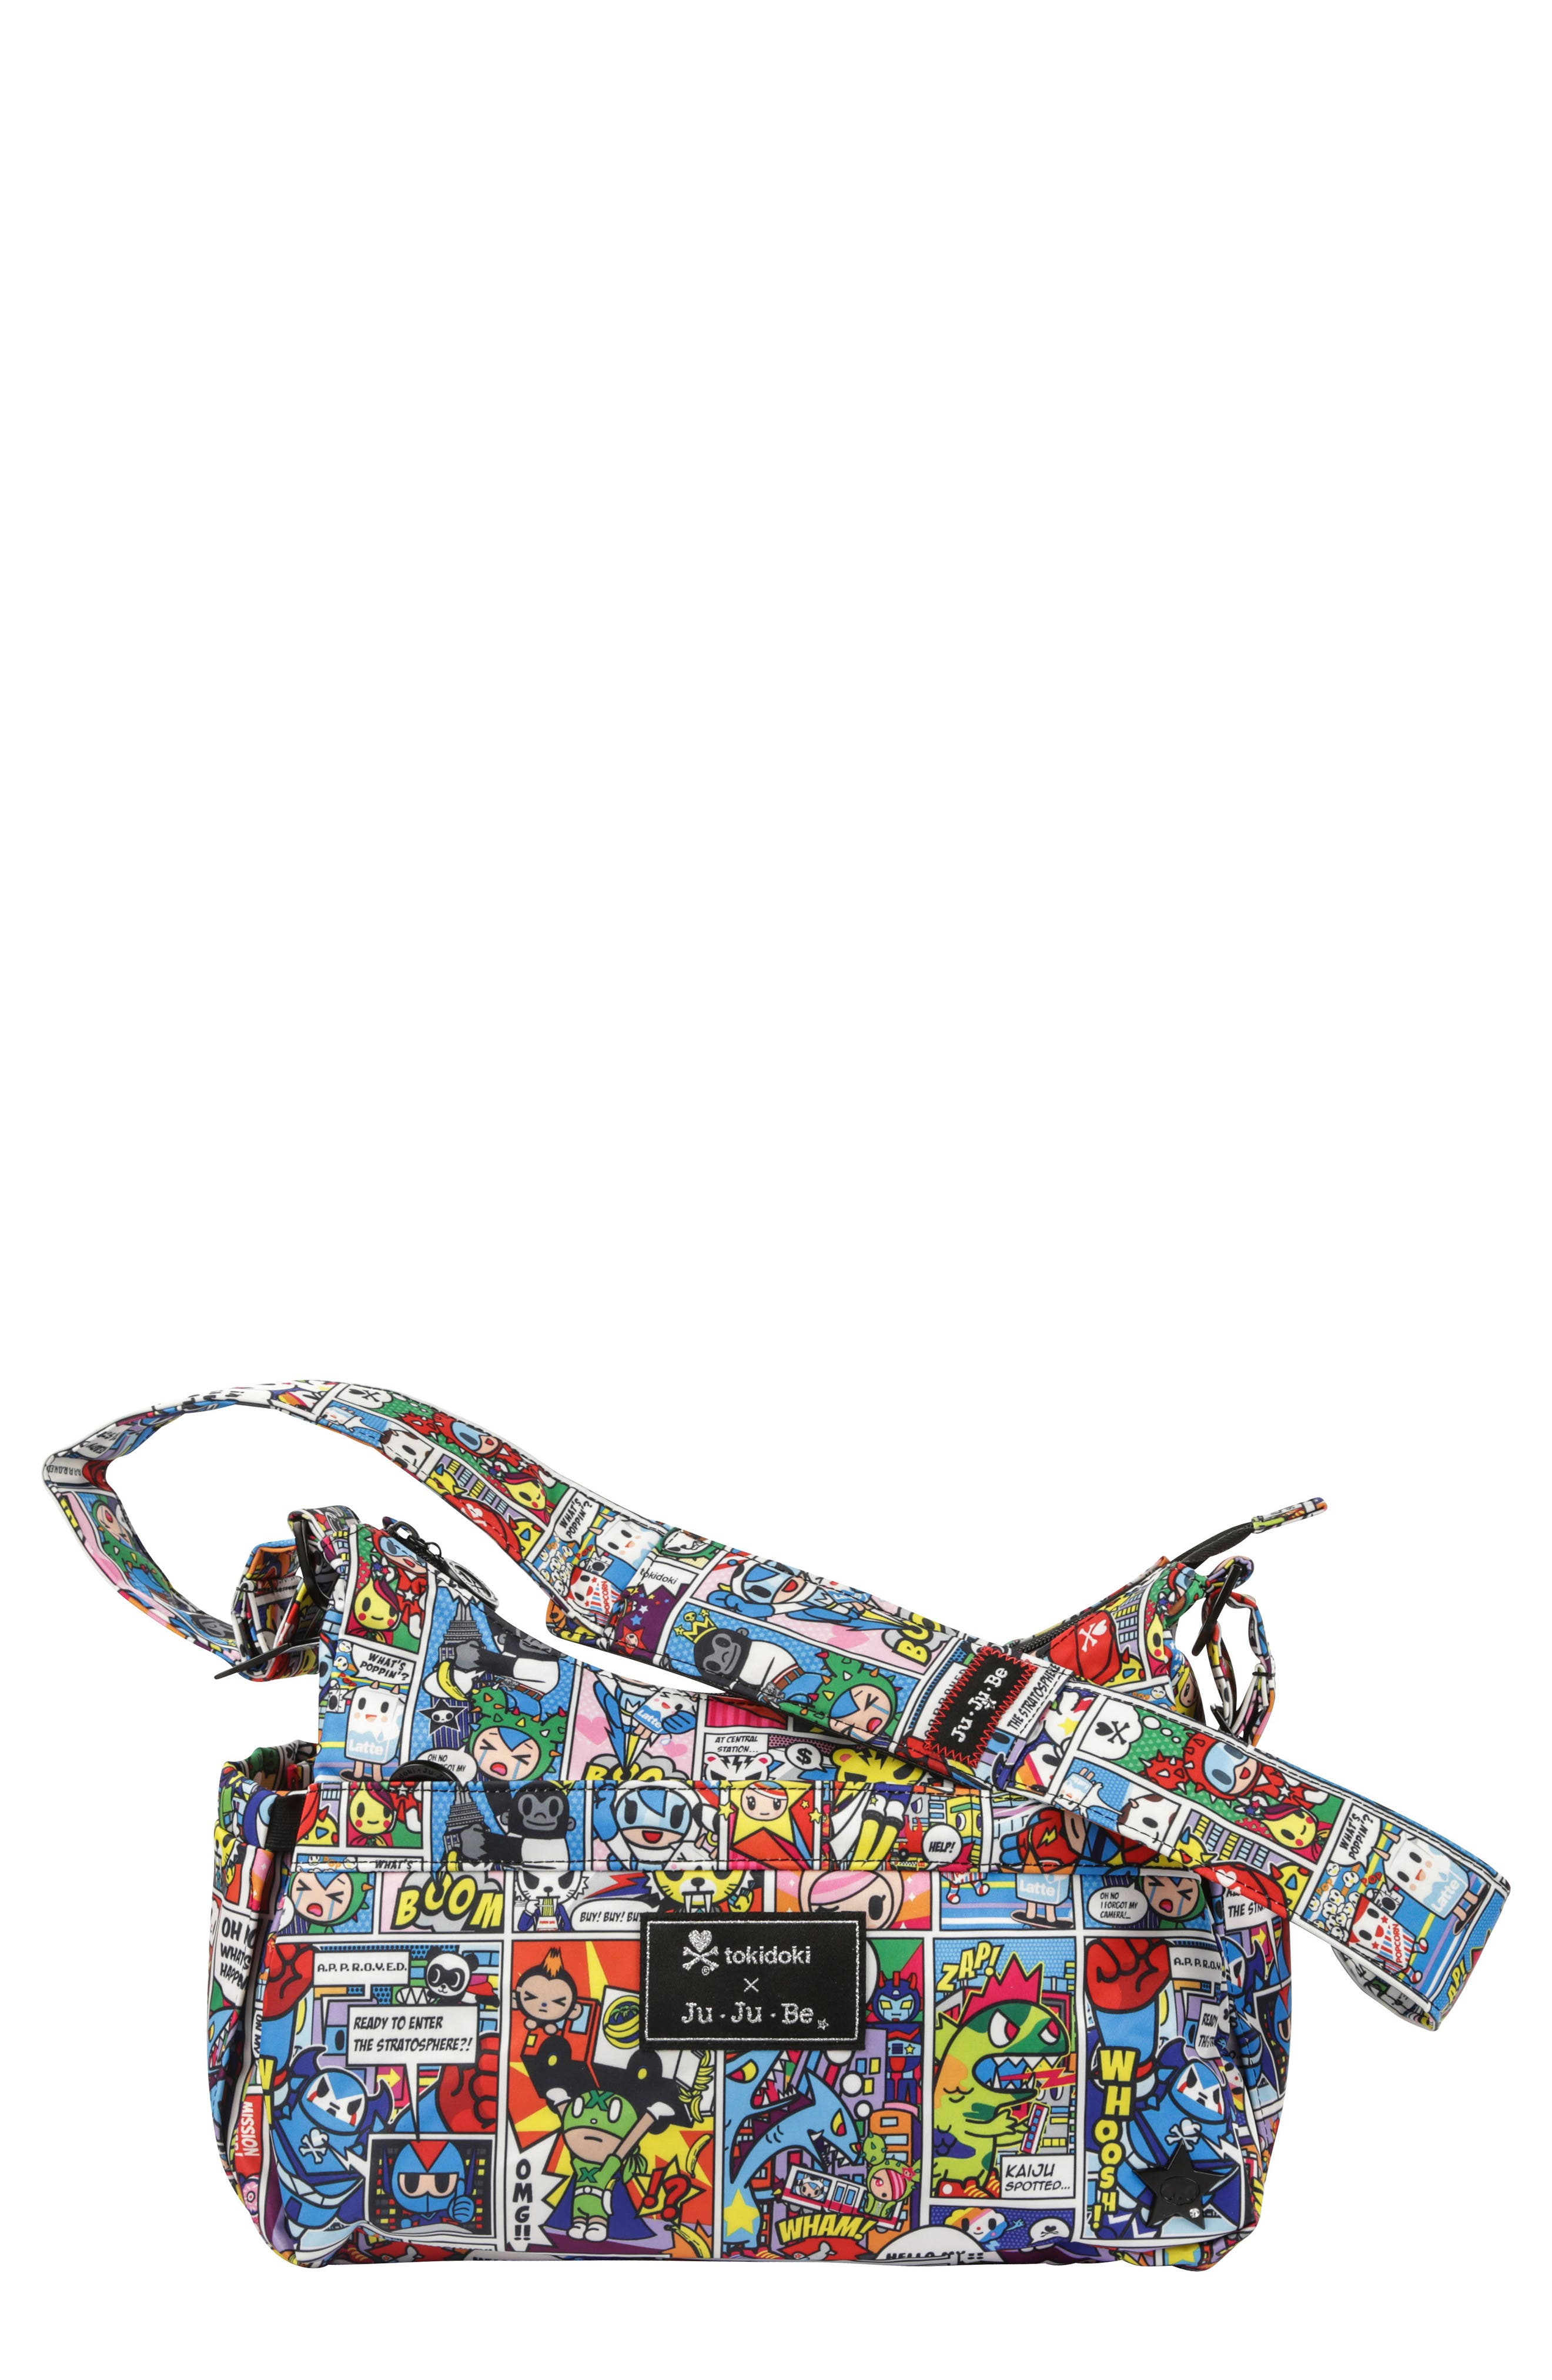 tokidoki x Ju-Ju-Be 'HoboBe' Diaper Bag